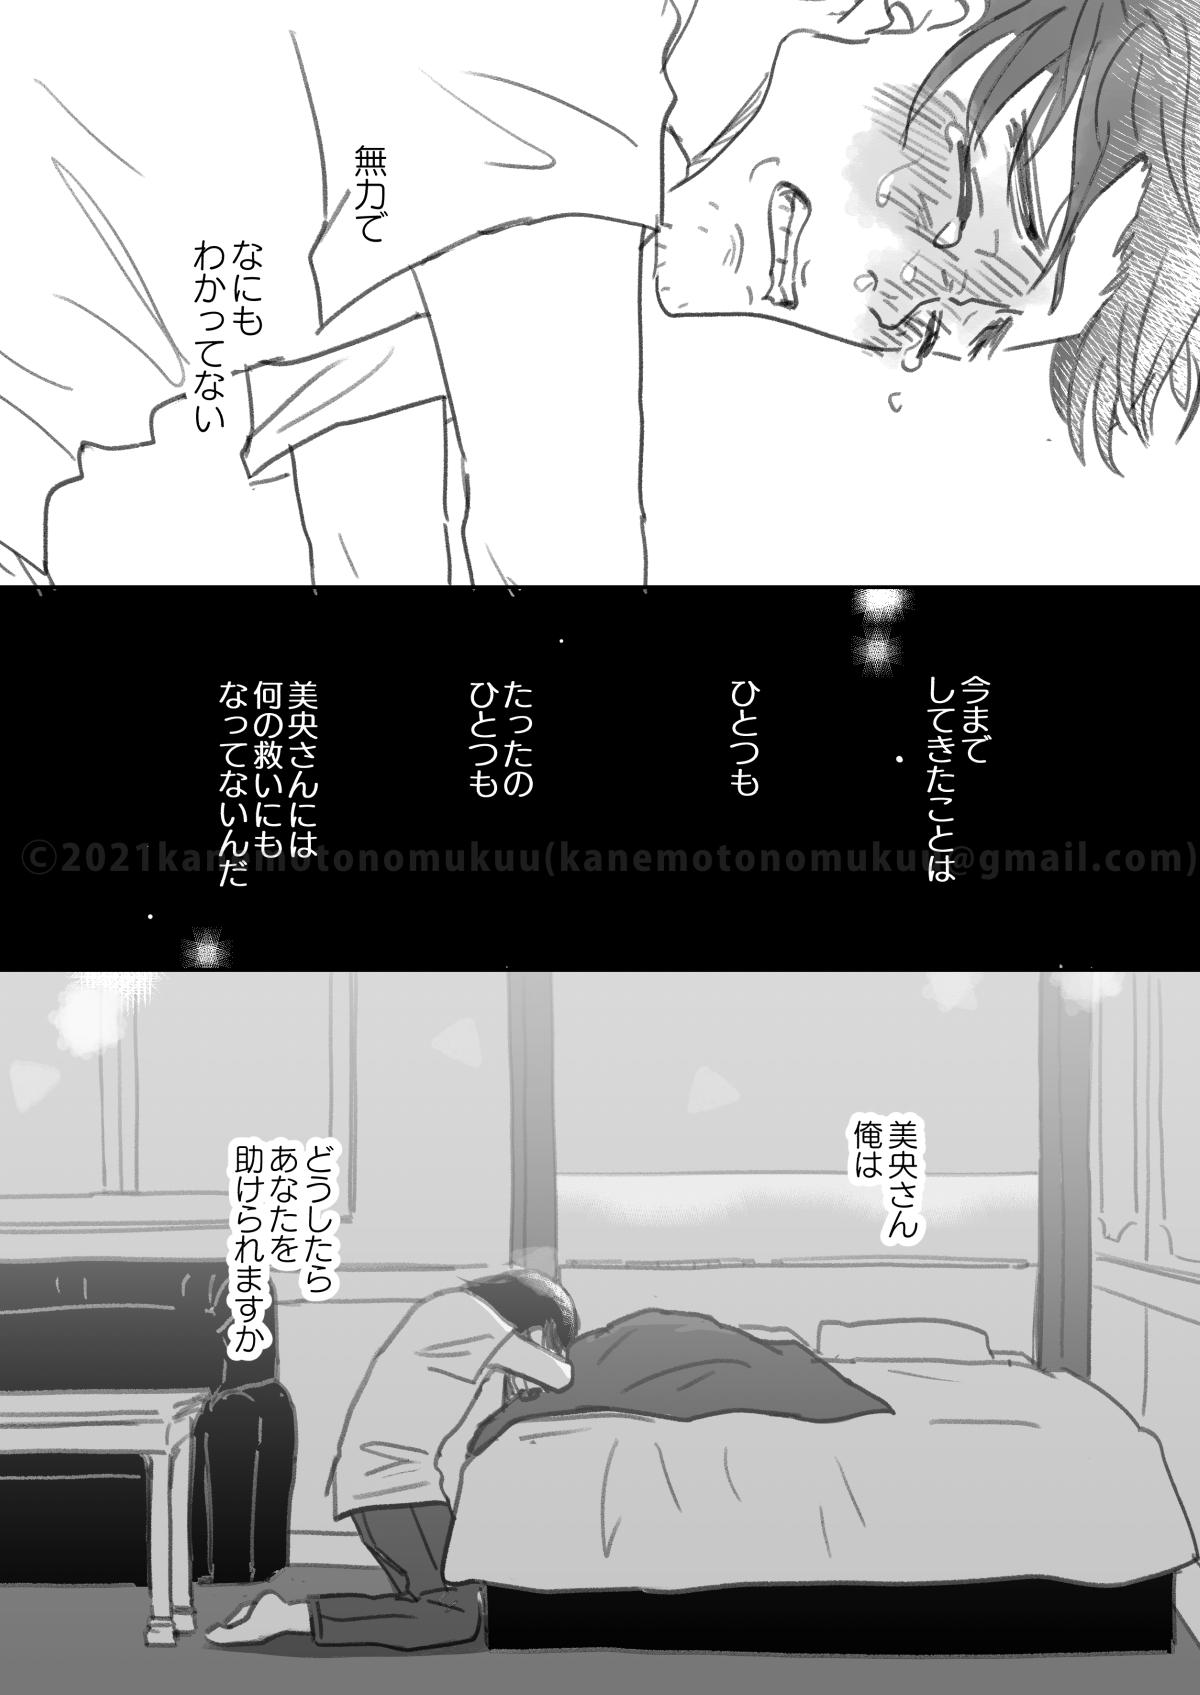 f:id:kanemotonomukuu:20210118100127j:plain